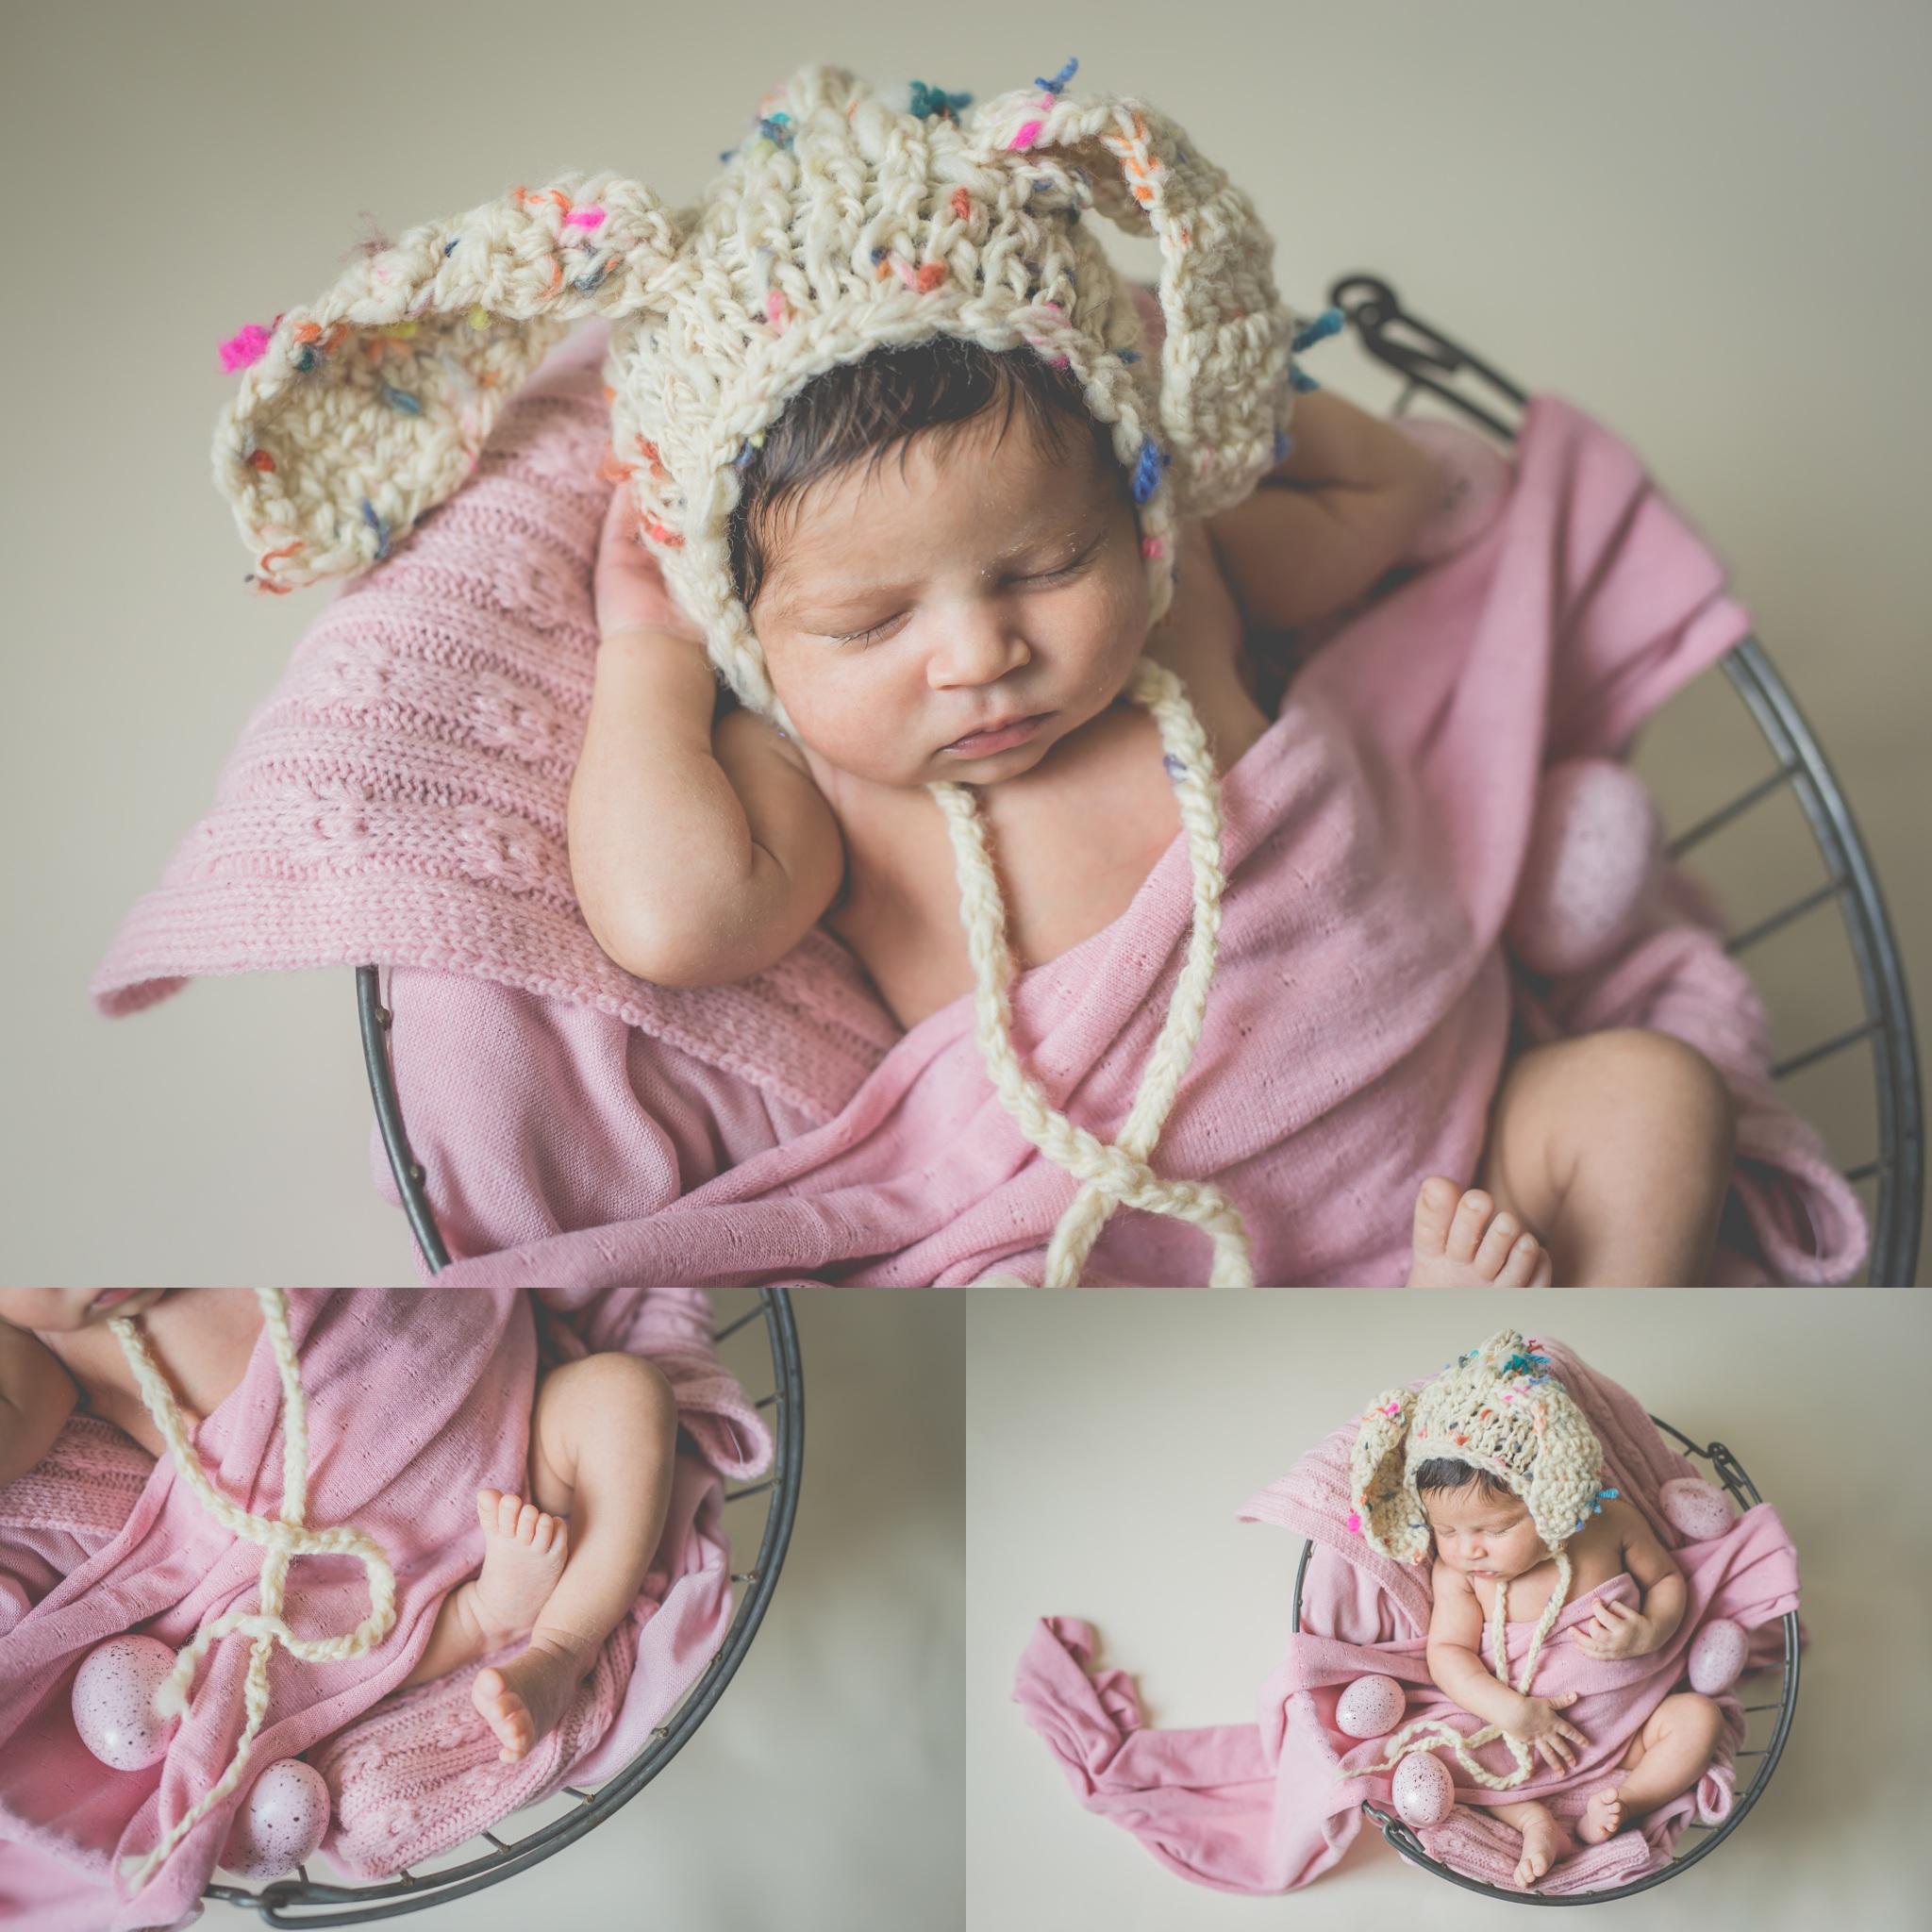 2017-01-25-anniston-newborn-baby-girl-pink-camdenton-missouri-lake-ozarks-photographer-springfield.jpg